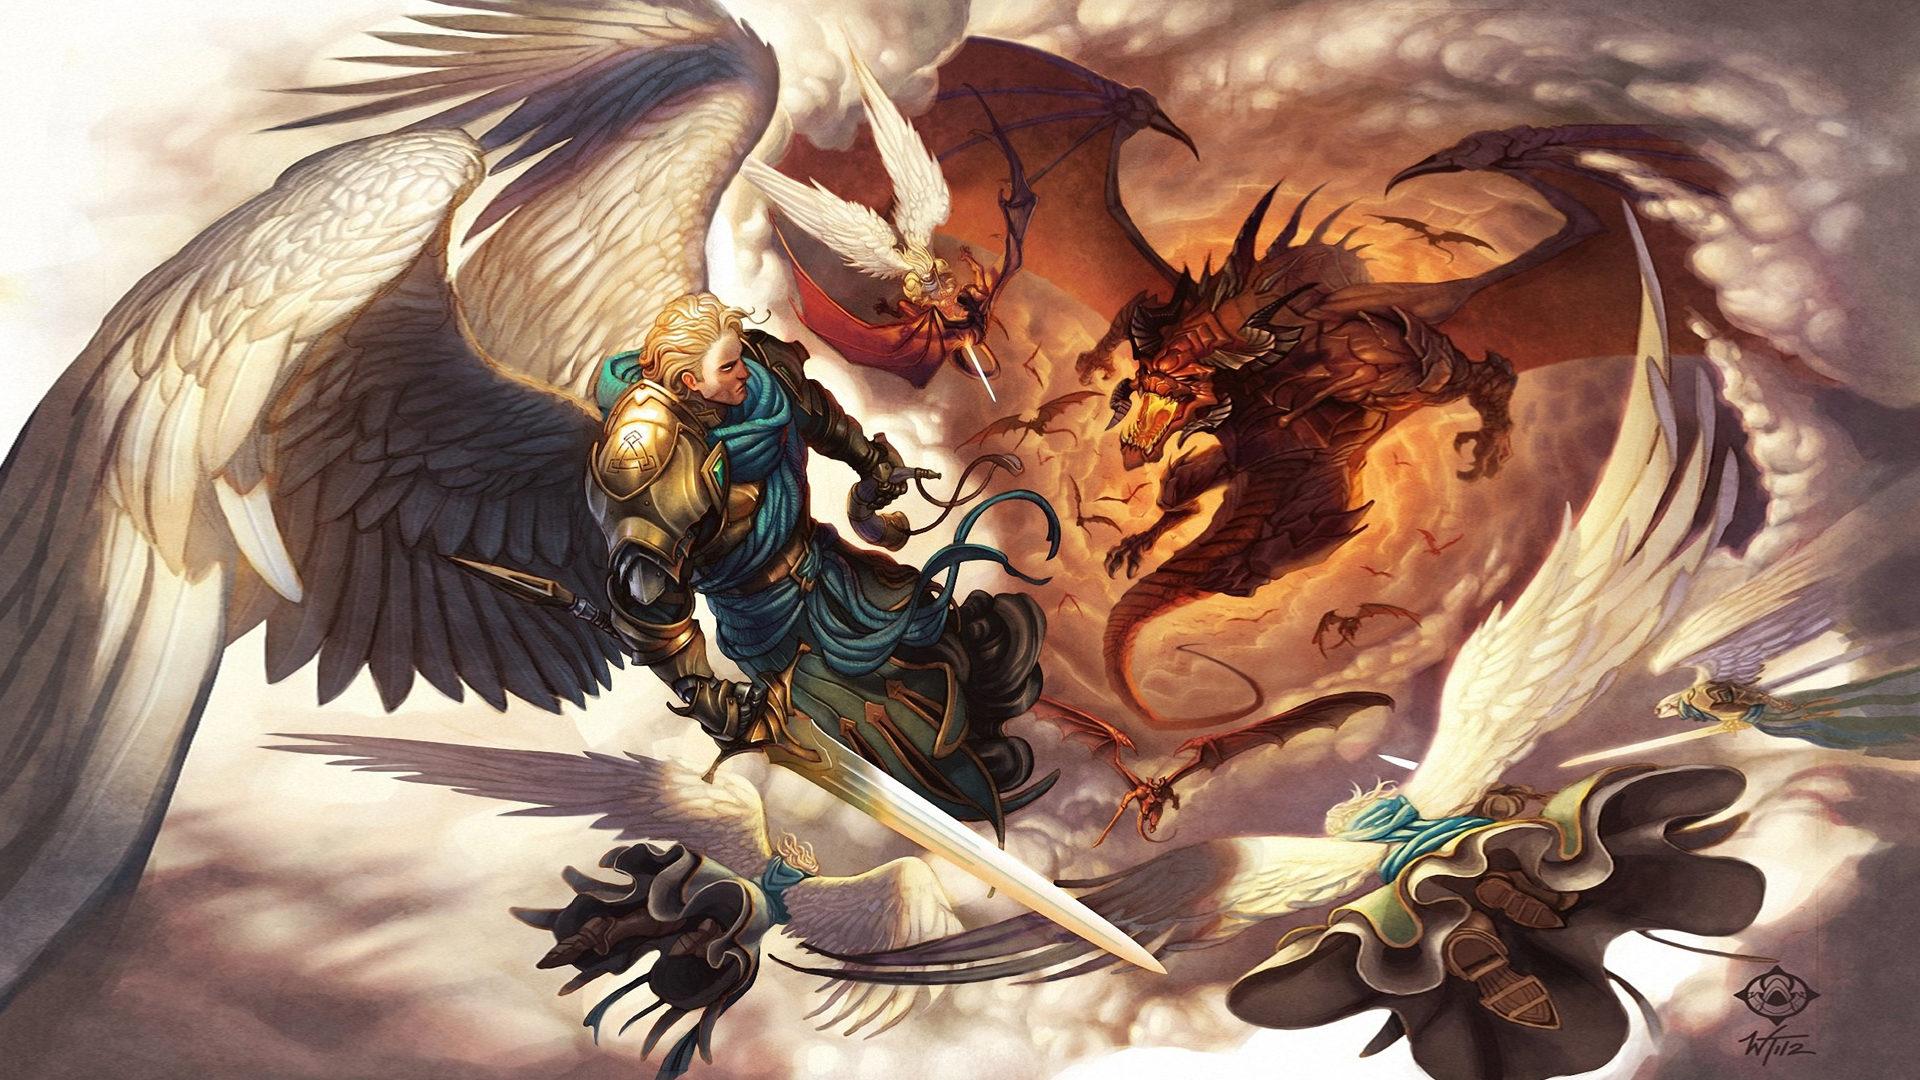 Archangel Michael Hd Wallpaper Battle With Dragon Angel Sword Armor Wing Flight Fantasy